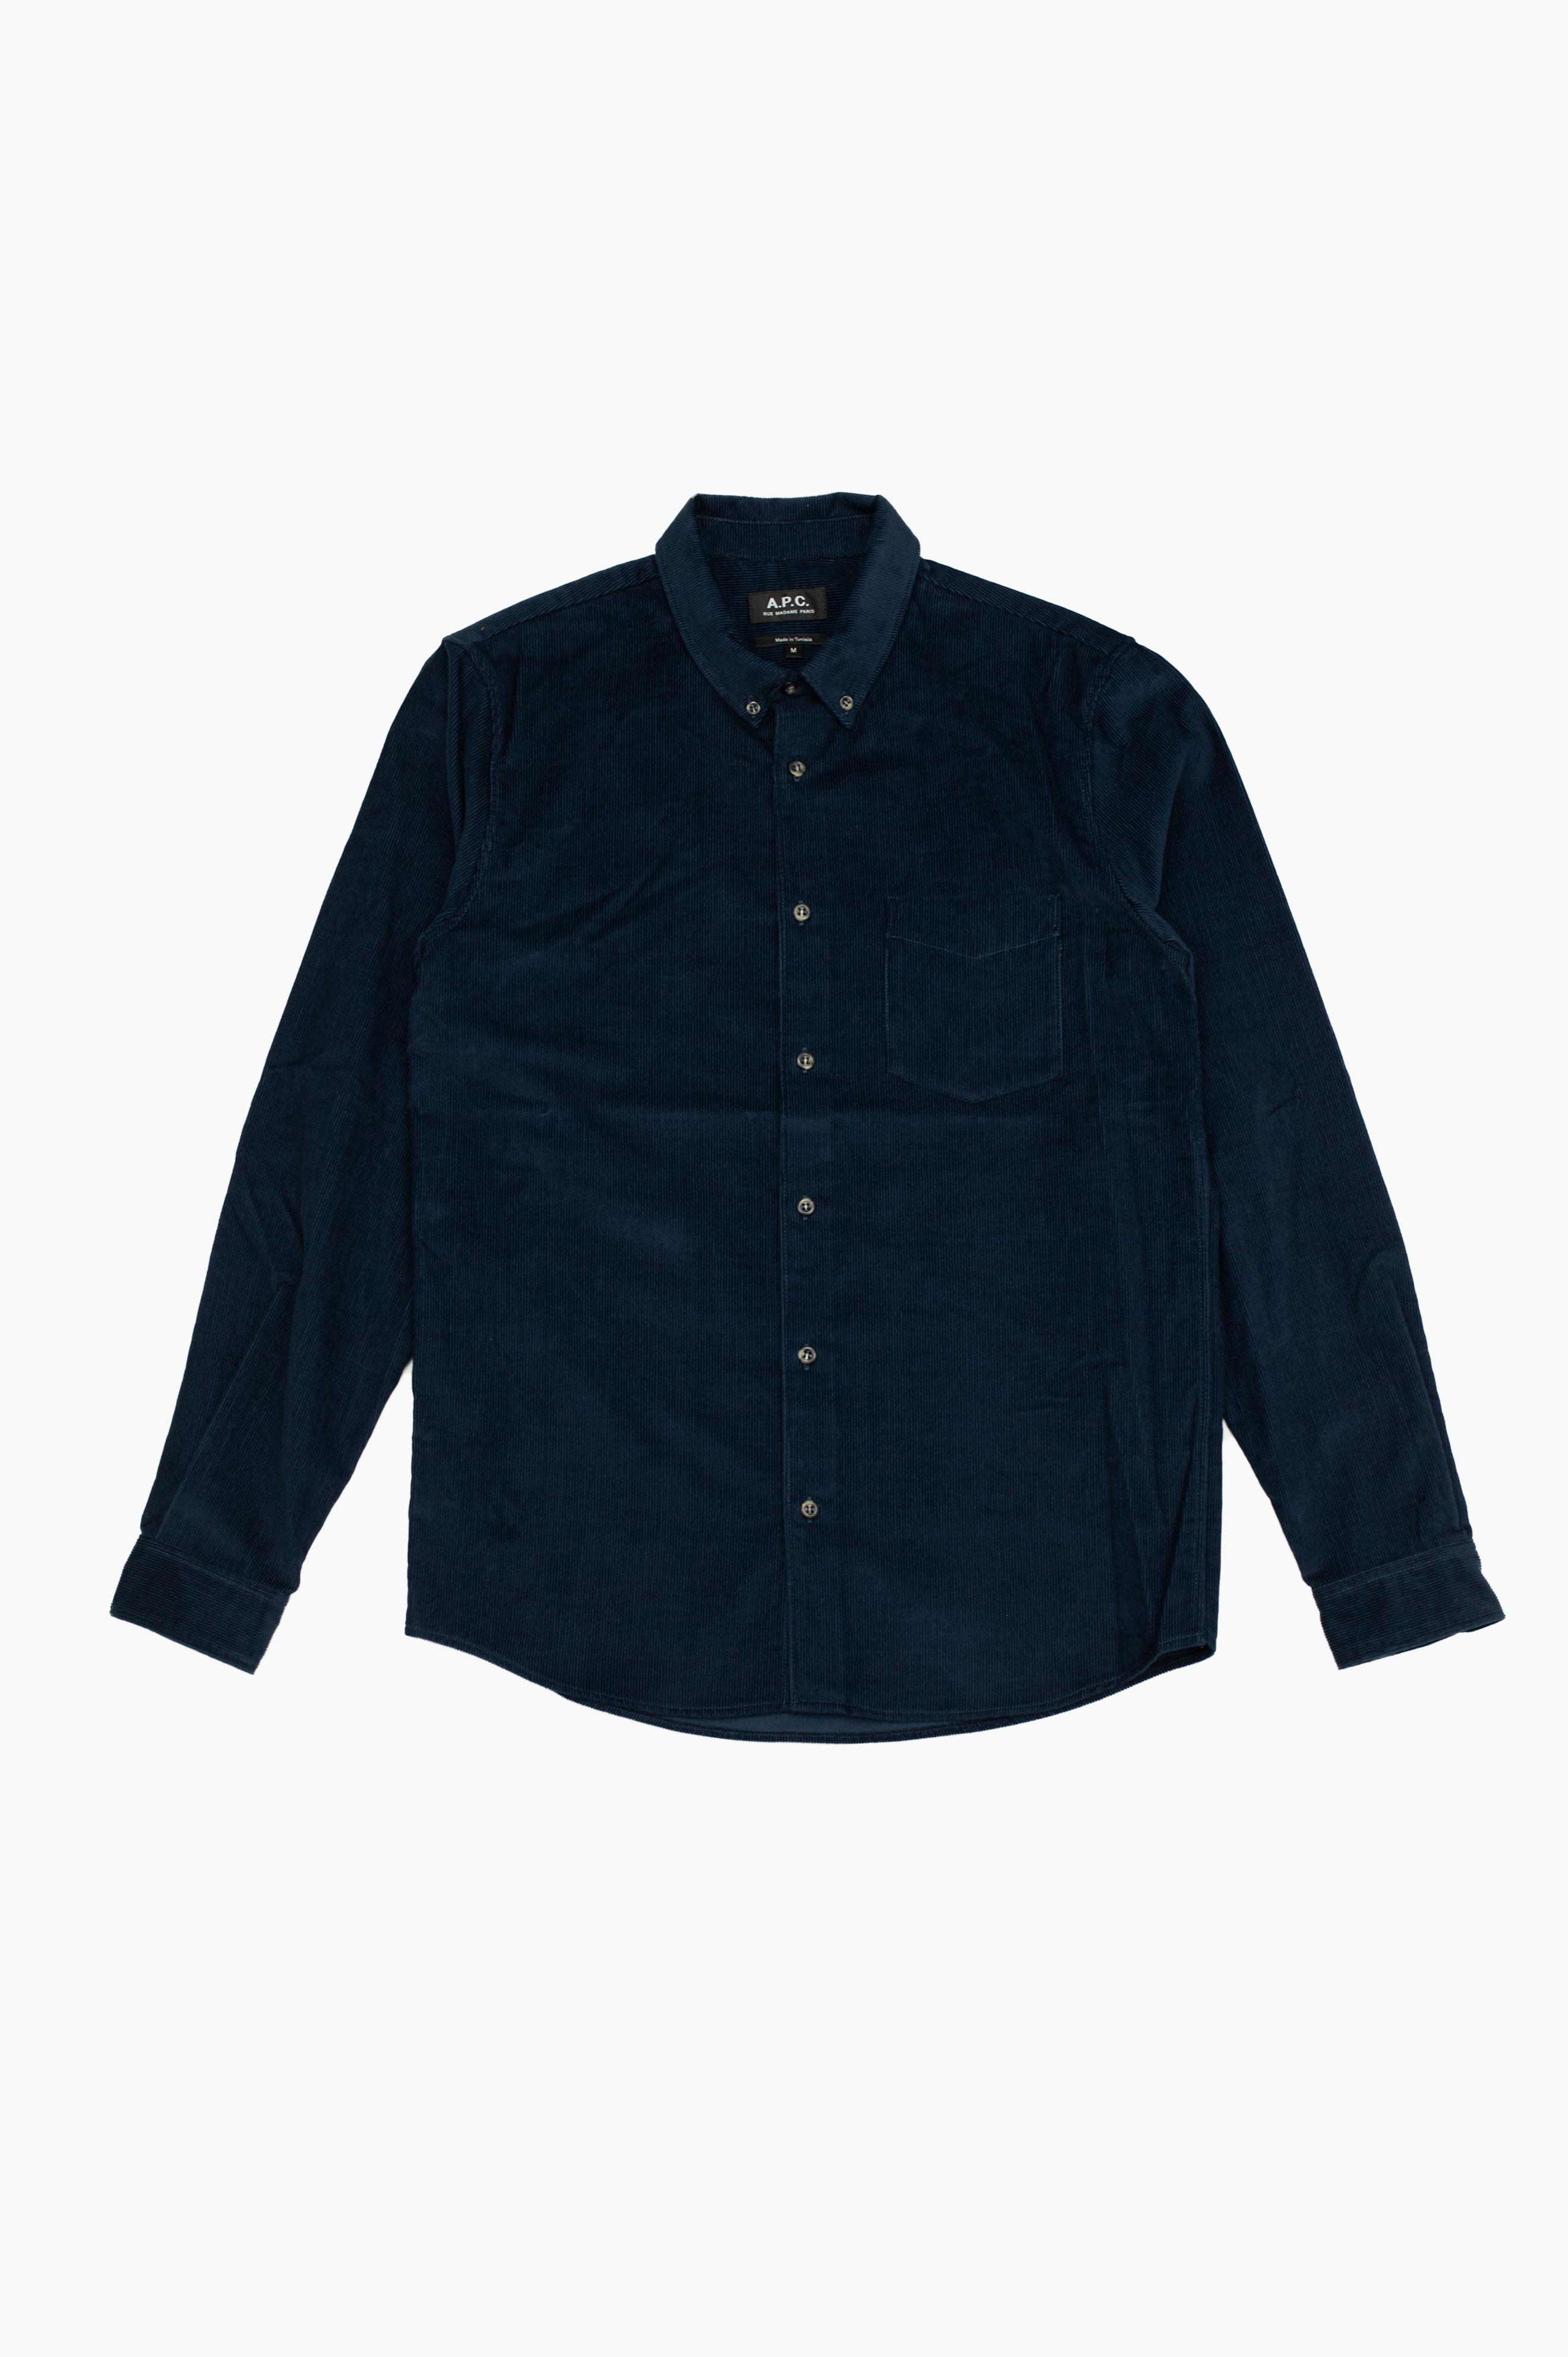 Serge Corduroy Shirt Navy